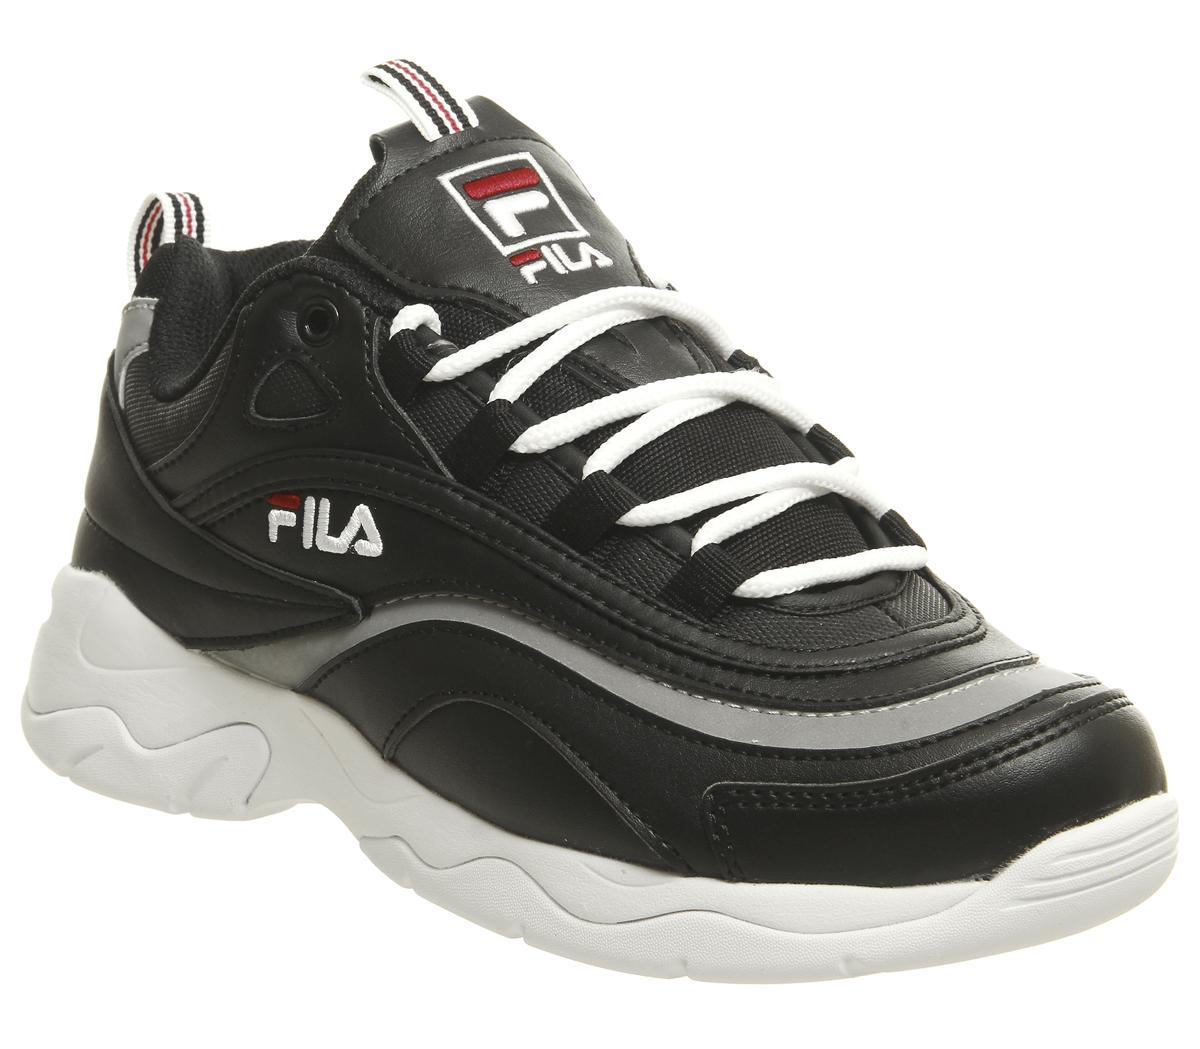 Fila Fila Ray Trainers Black Fila Red